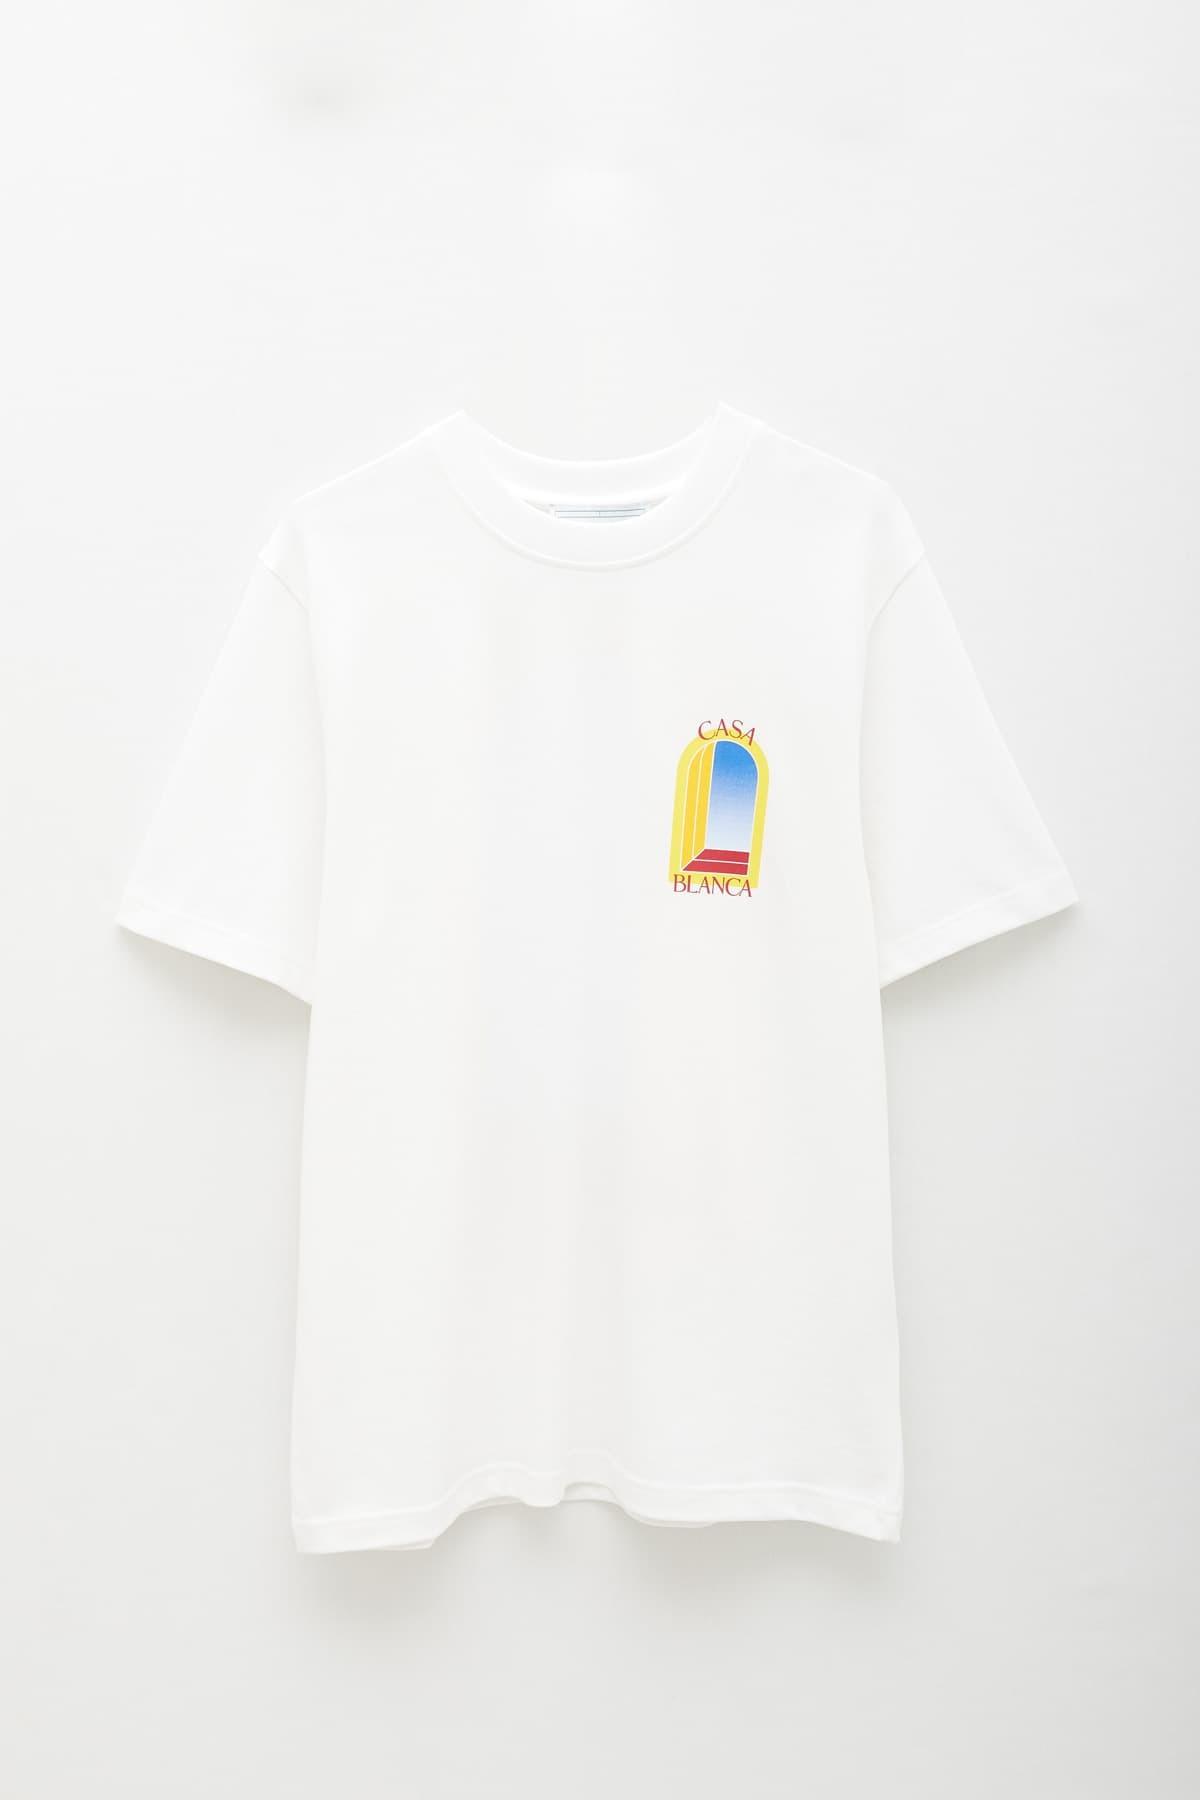 Comprar Aries Red Tailored Column Jacquard Trouser